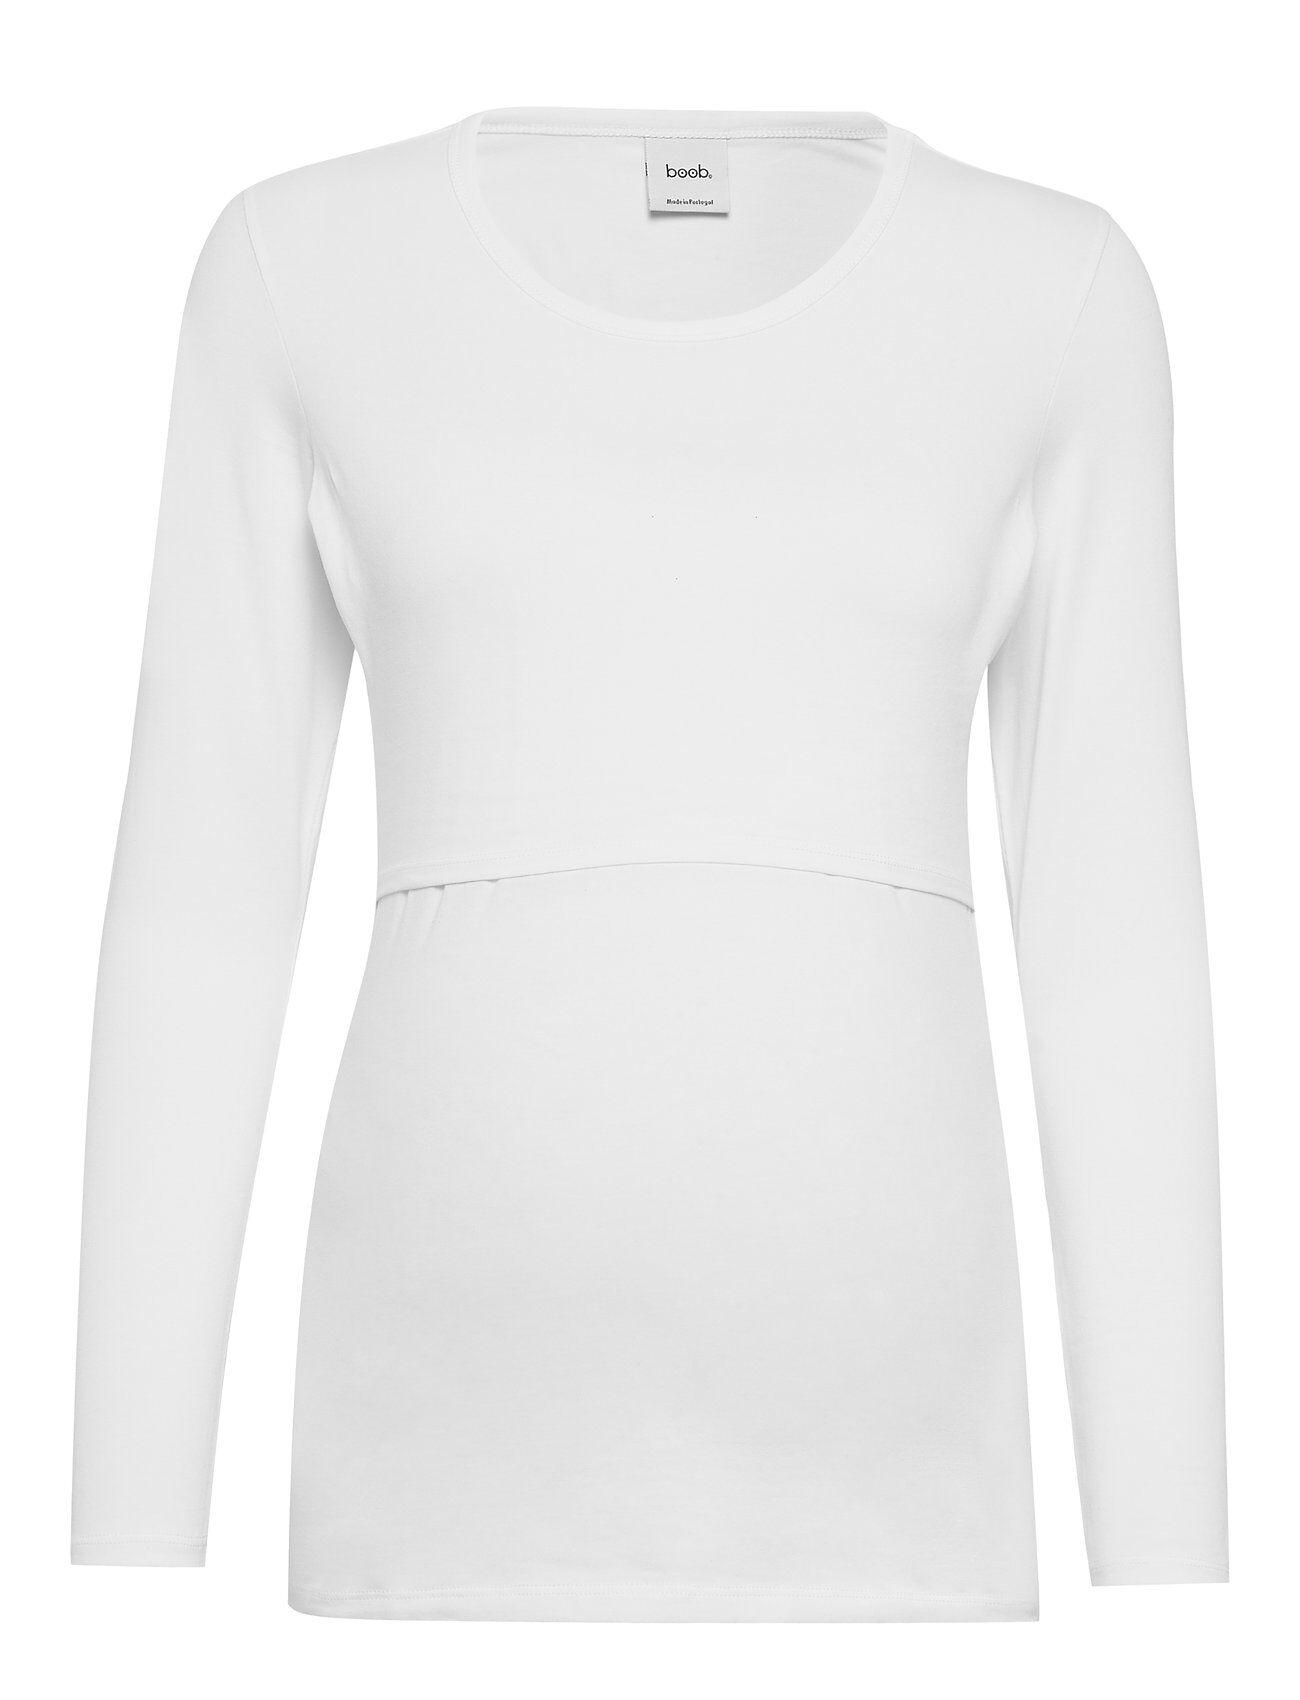 Boob Classic Long-Sleeved Top T-shirts & Tops Long-sleeved Valkoinen Boob